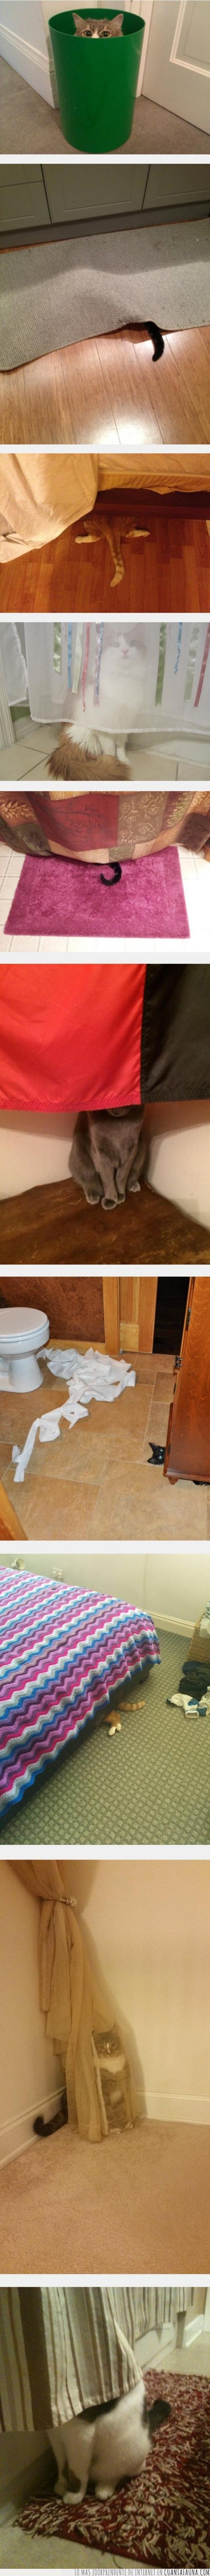 camuflaje,epic fail,esconderse,fail,gato,genial